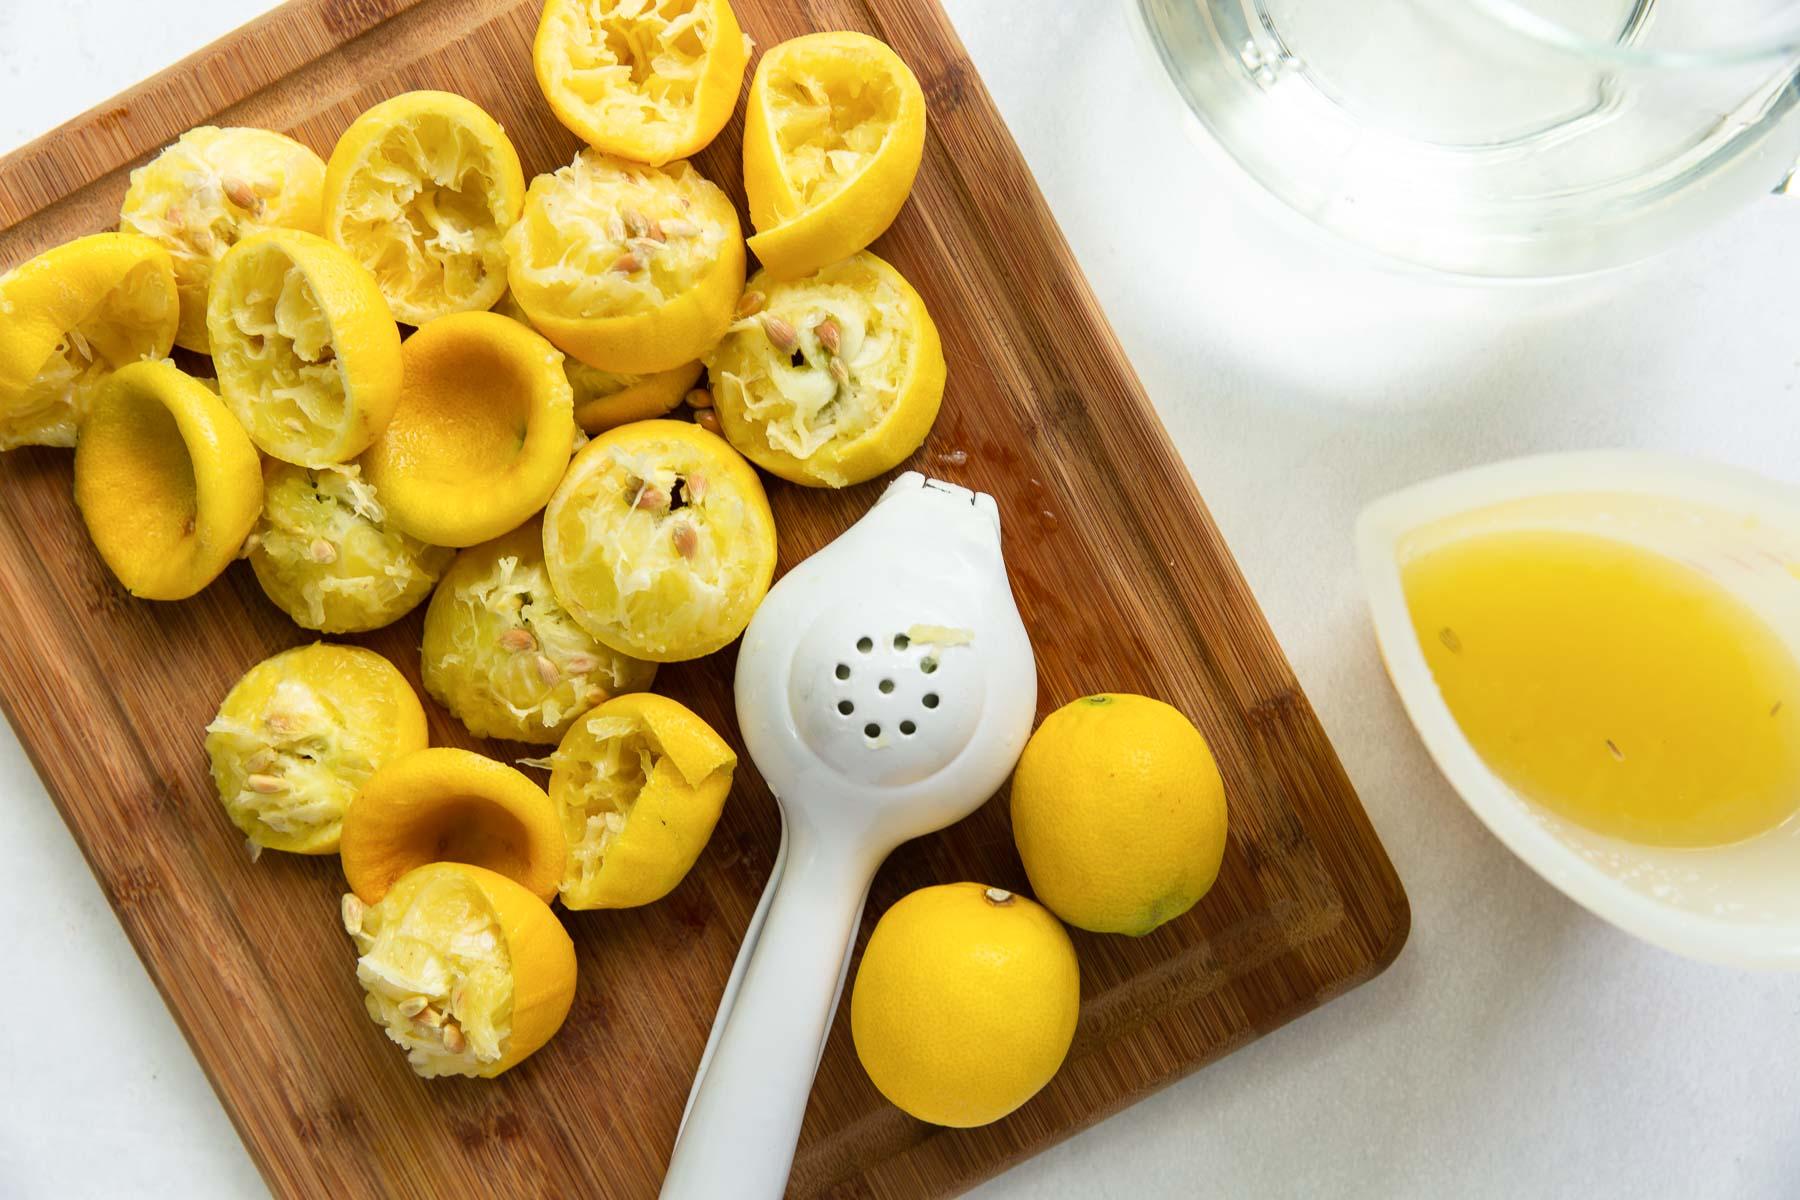 juiced lemons and juicer on a cutting board for lemonade